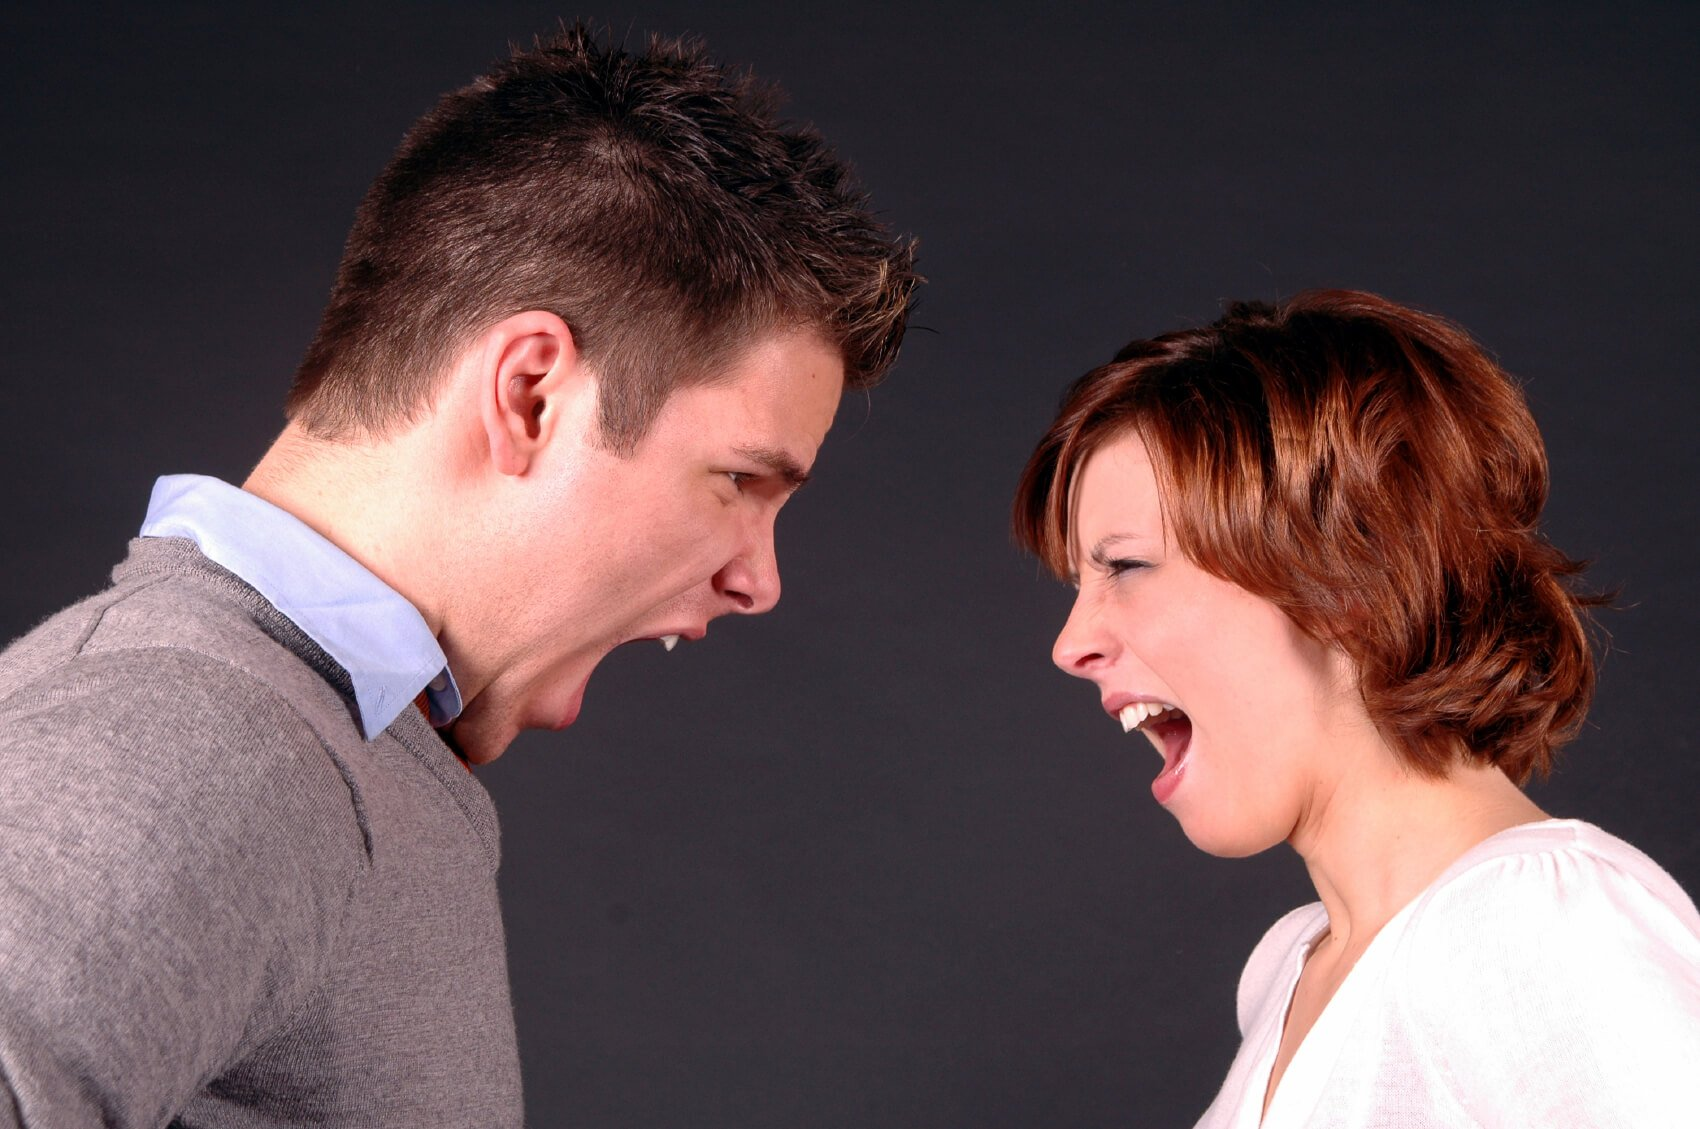 rhode island domestic violence